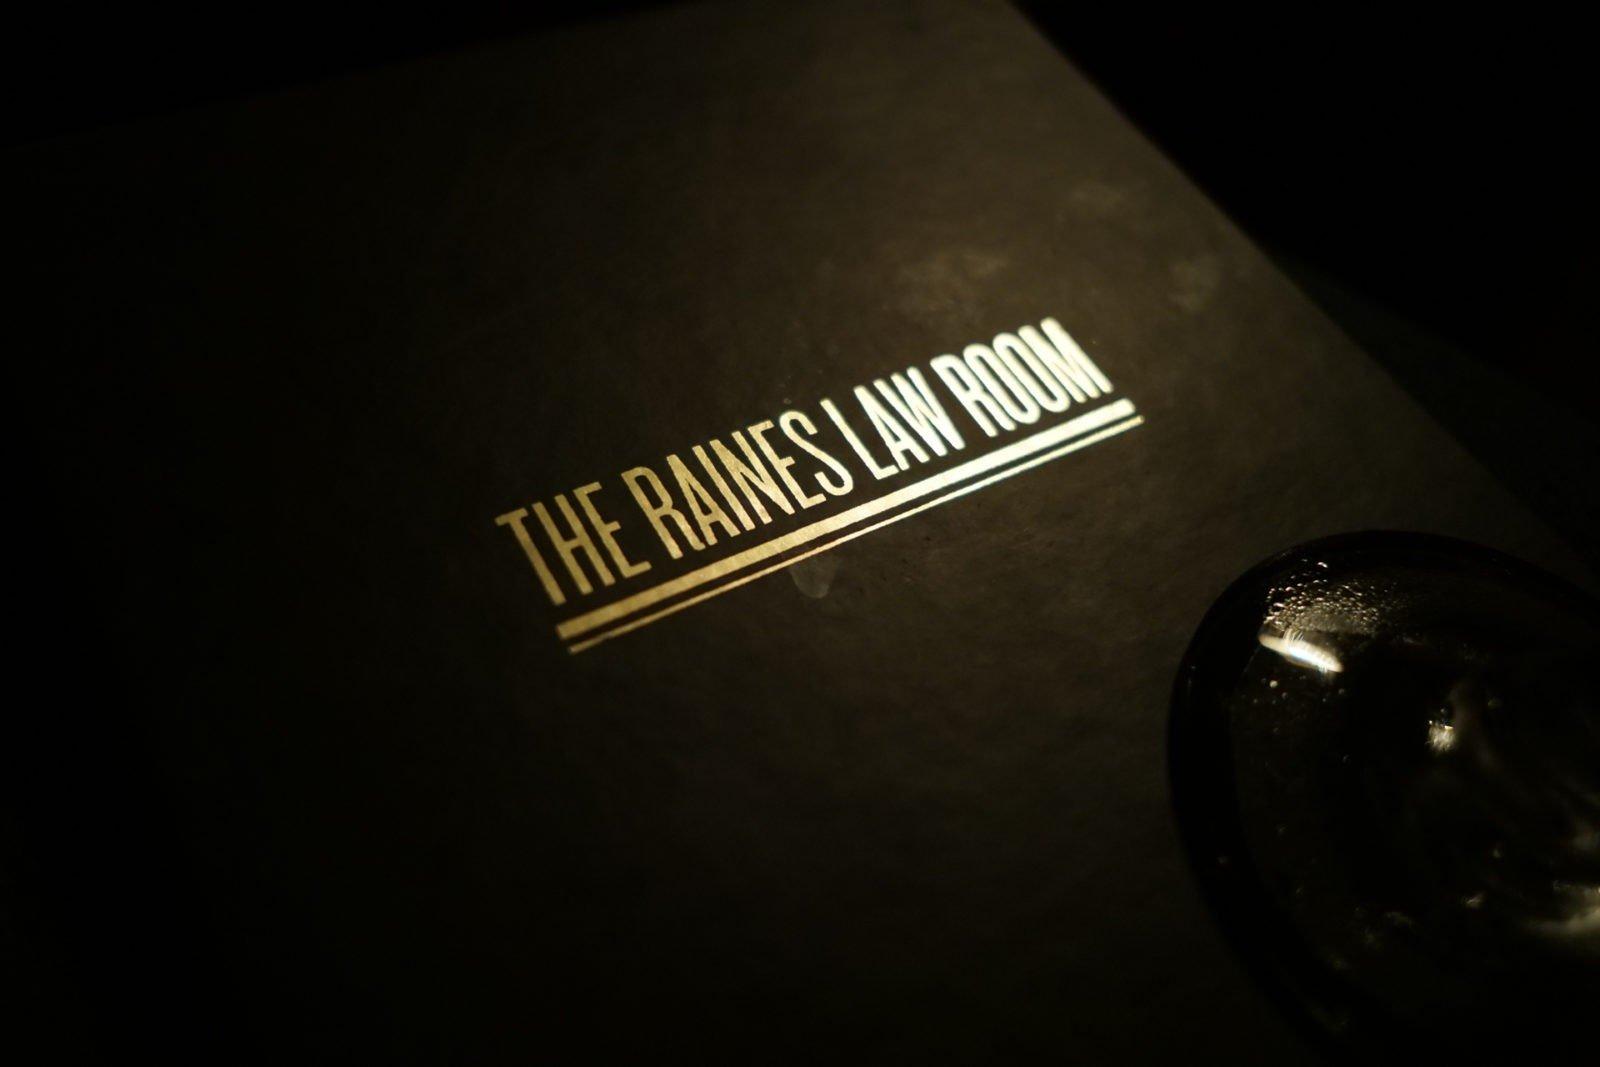 Raines Law Room New York City Secret Bar menu